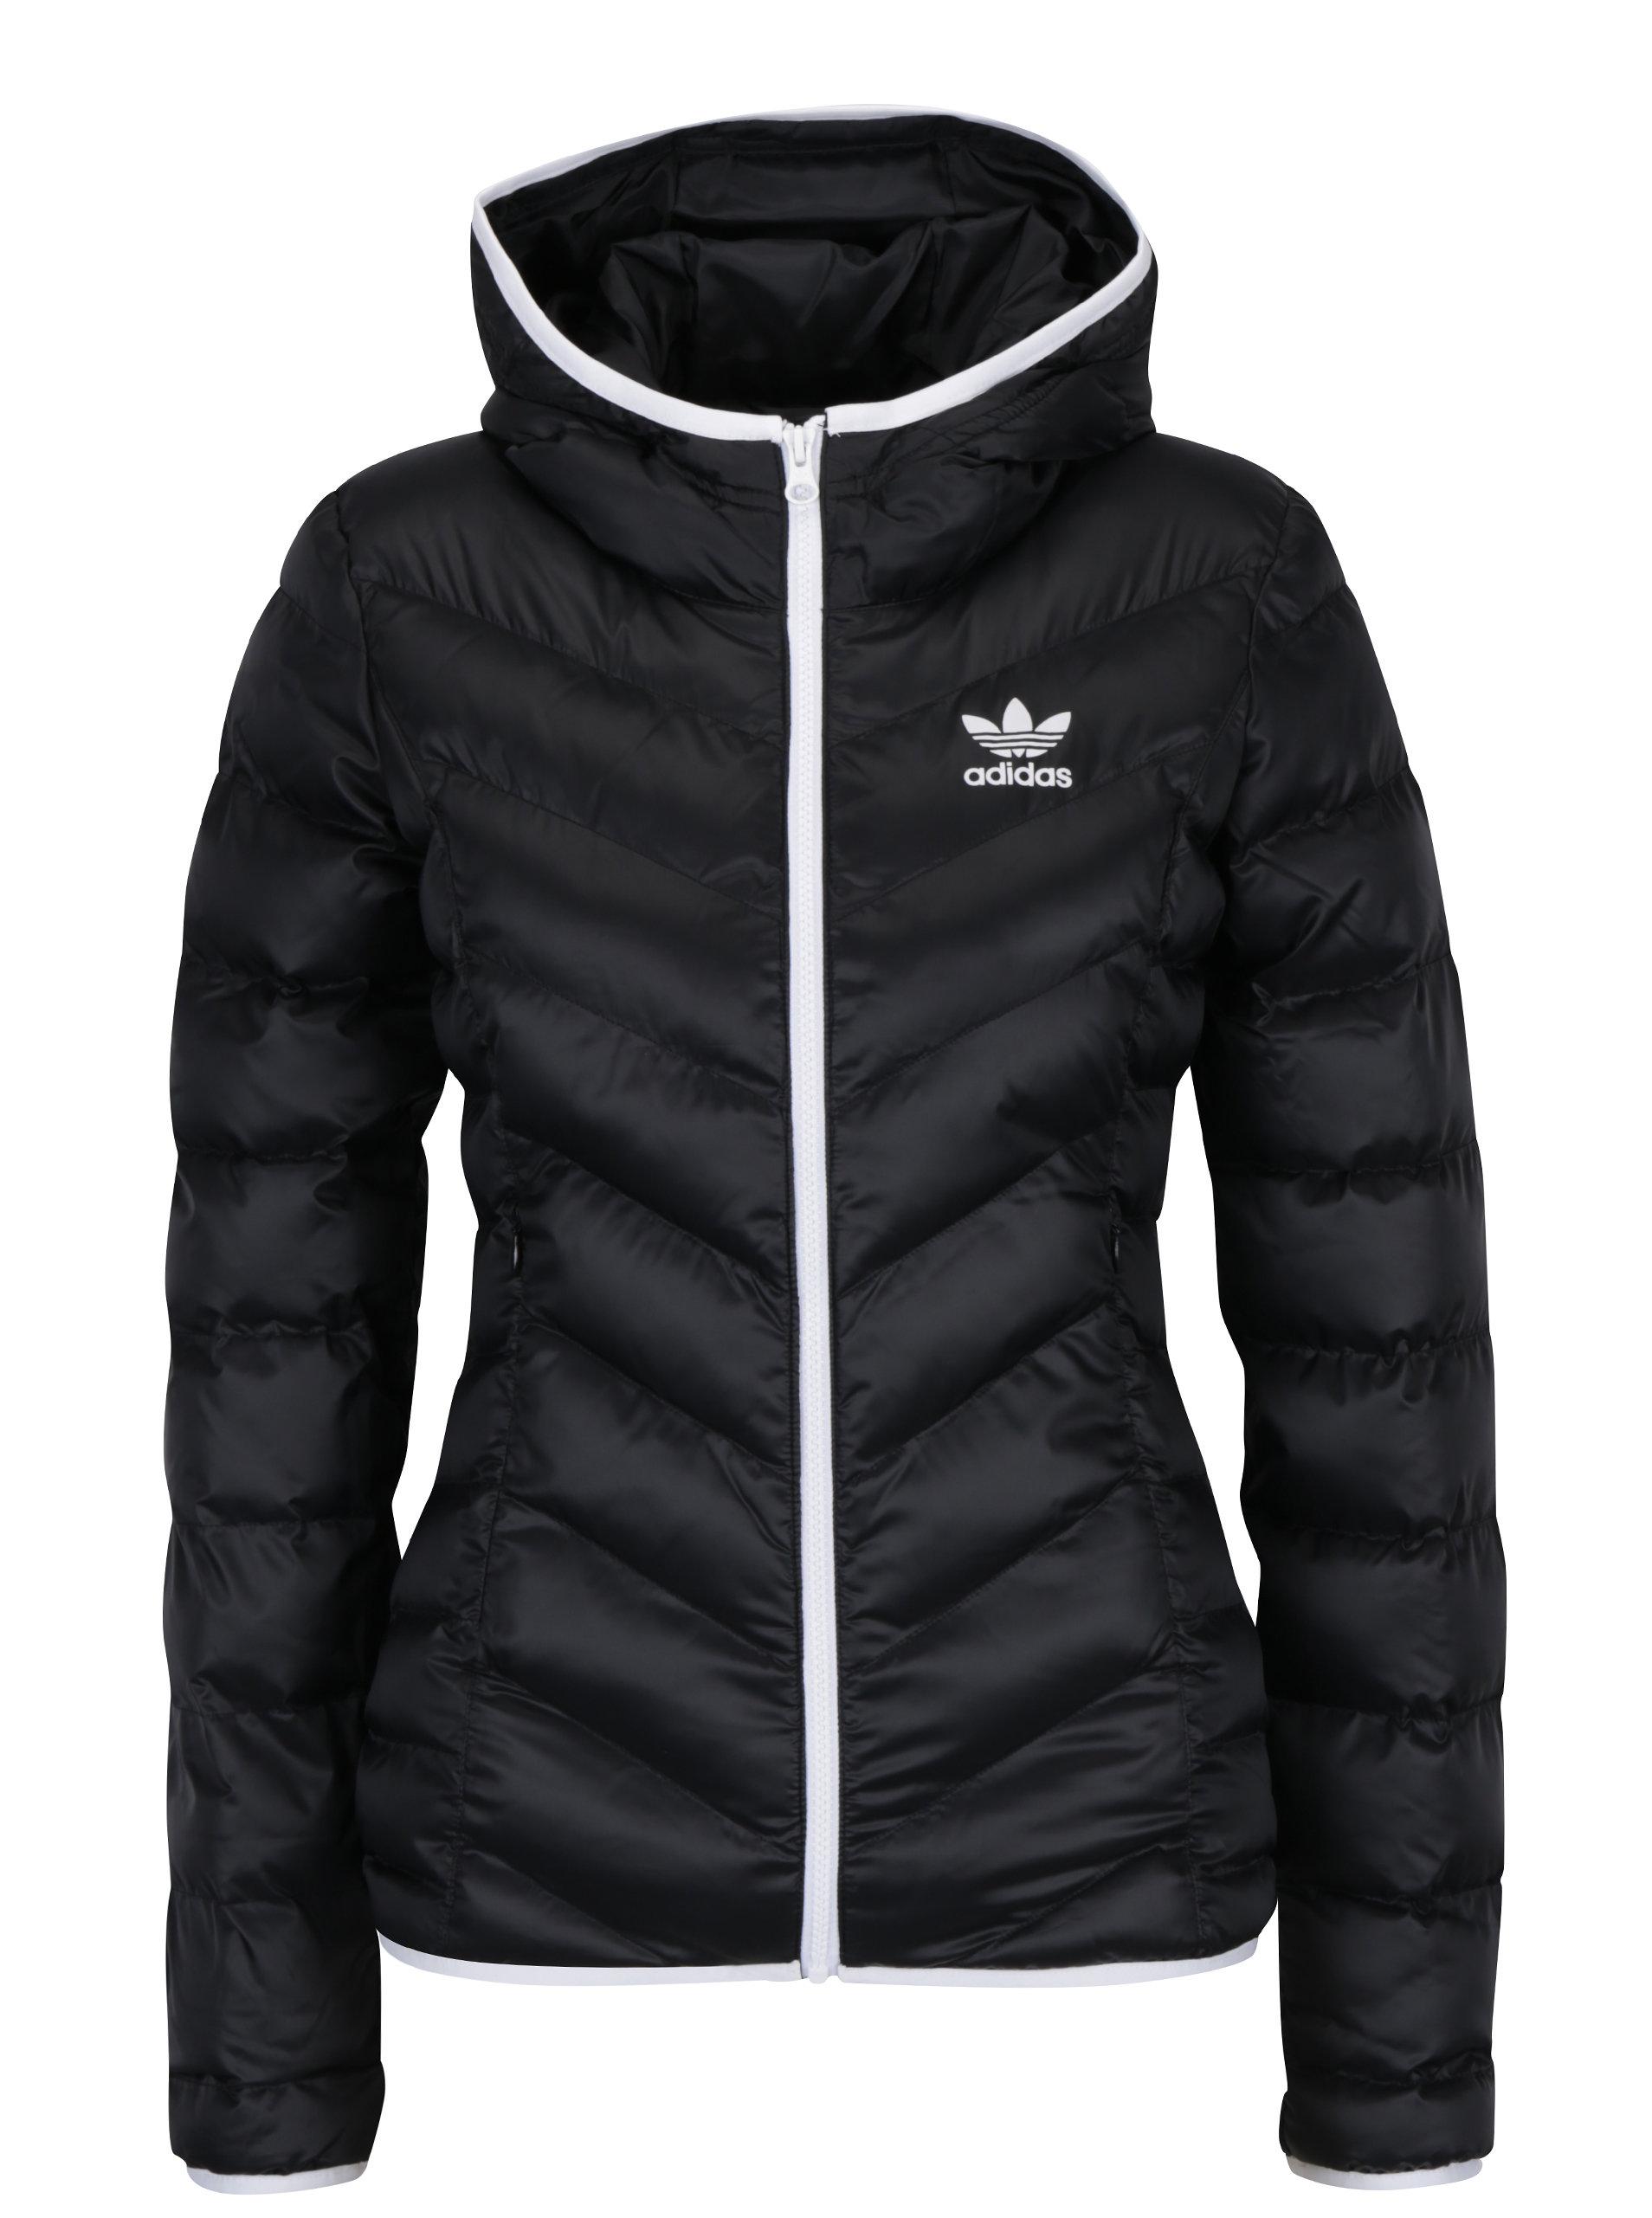 Čierna dámska prešívaná bunda s kapucňou adidas Originals Slim ... 7e778a815b1